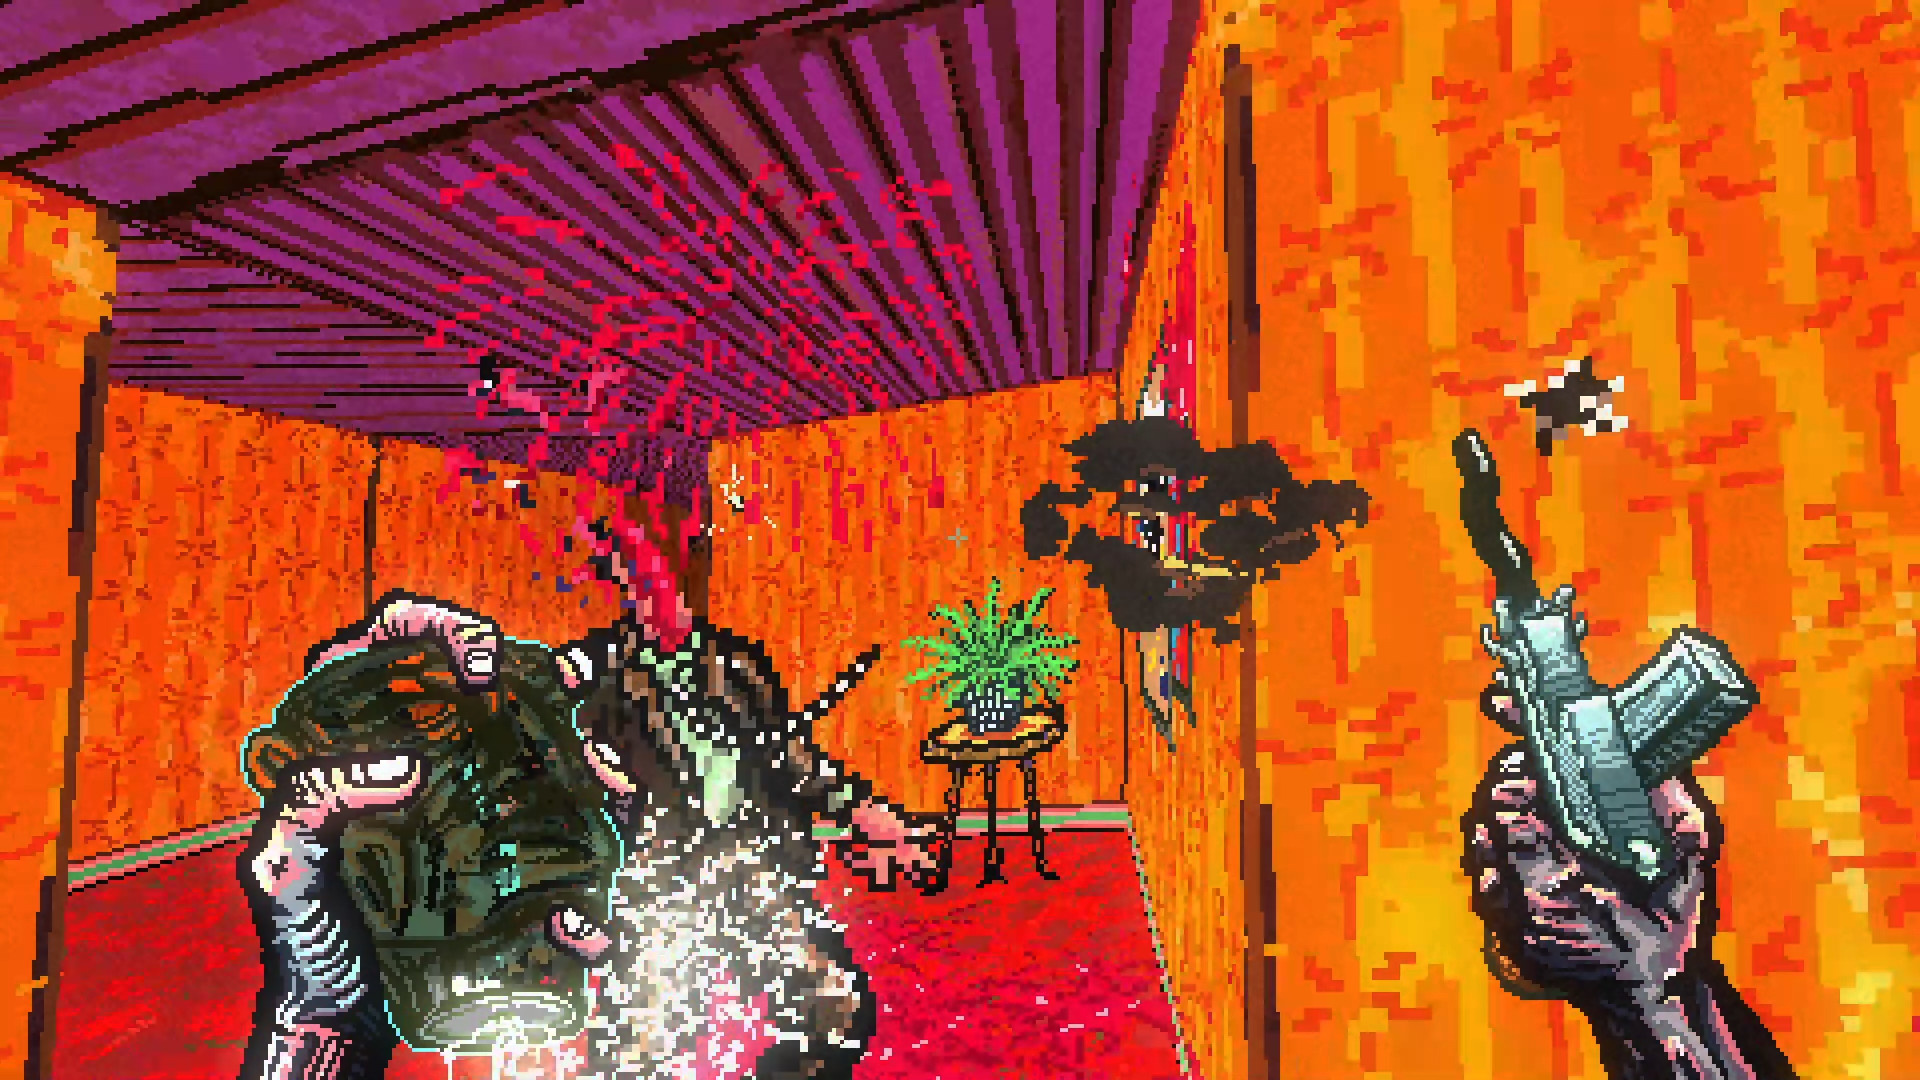 Психоделический ретро-шутер Post Void вышел в Steam